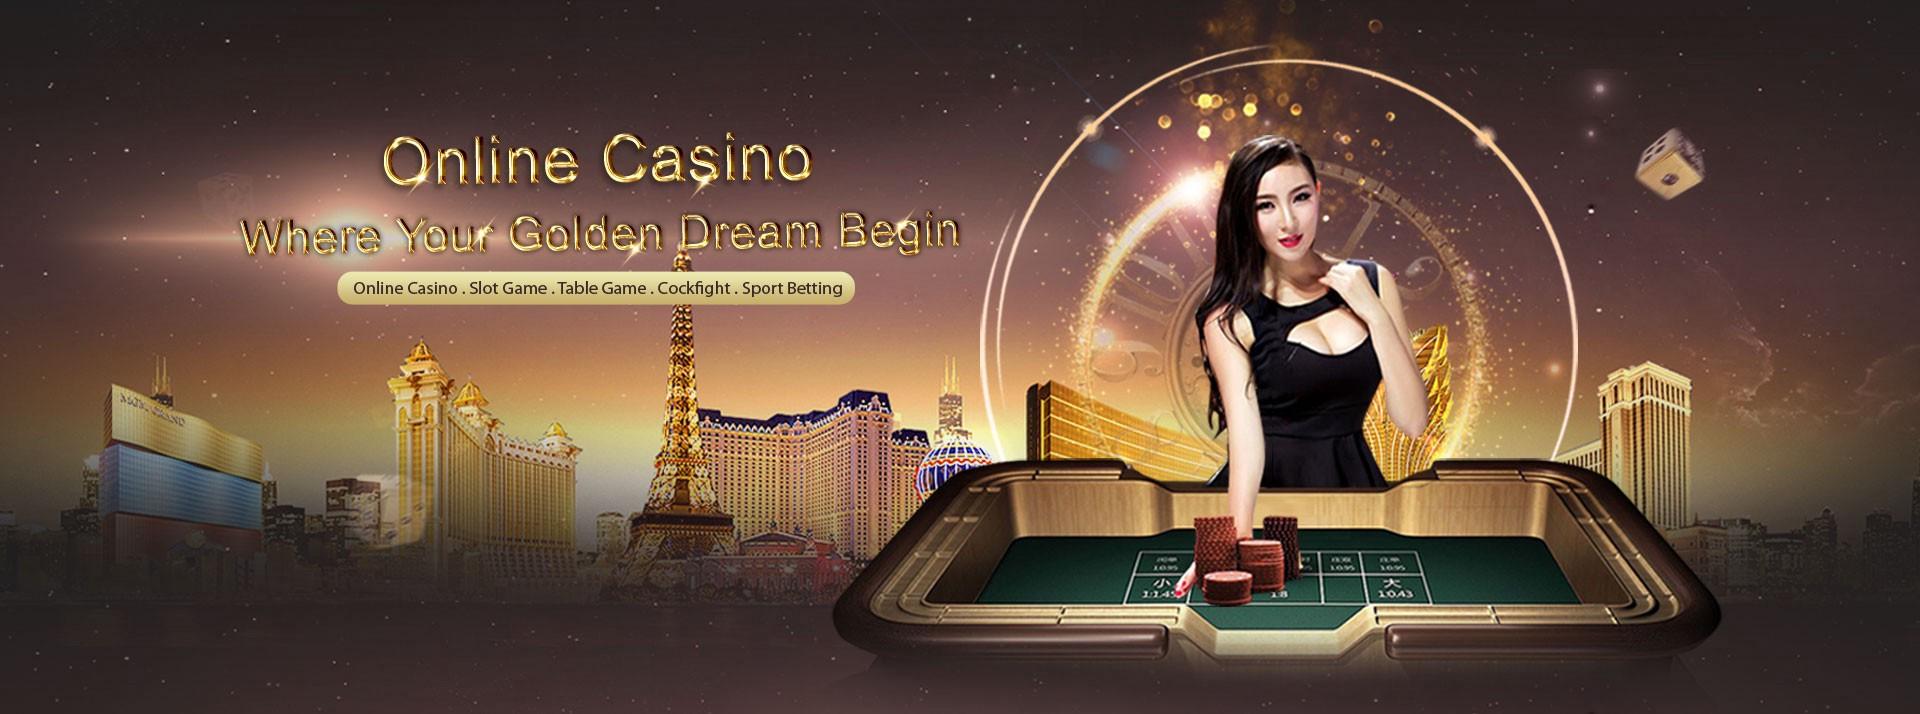 1 Q LFEyweQF4aMrN48k2bkQ - Top 3 Best Online Malaysian Casinos